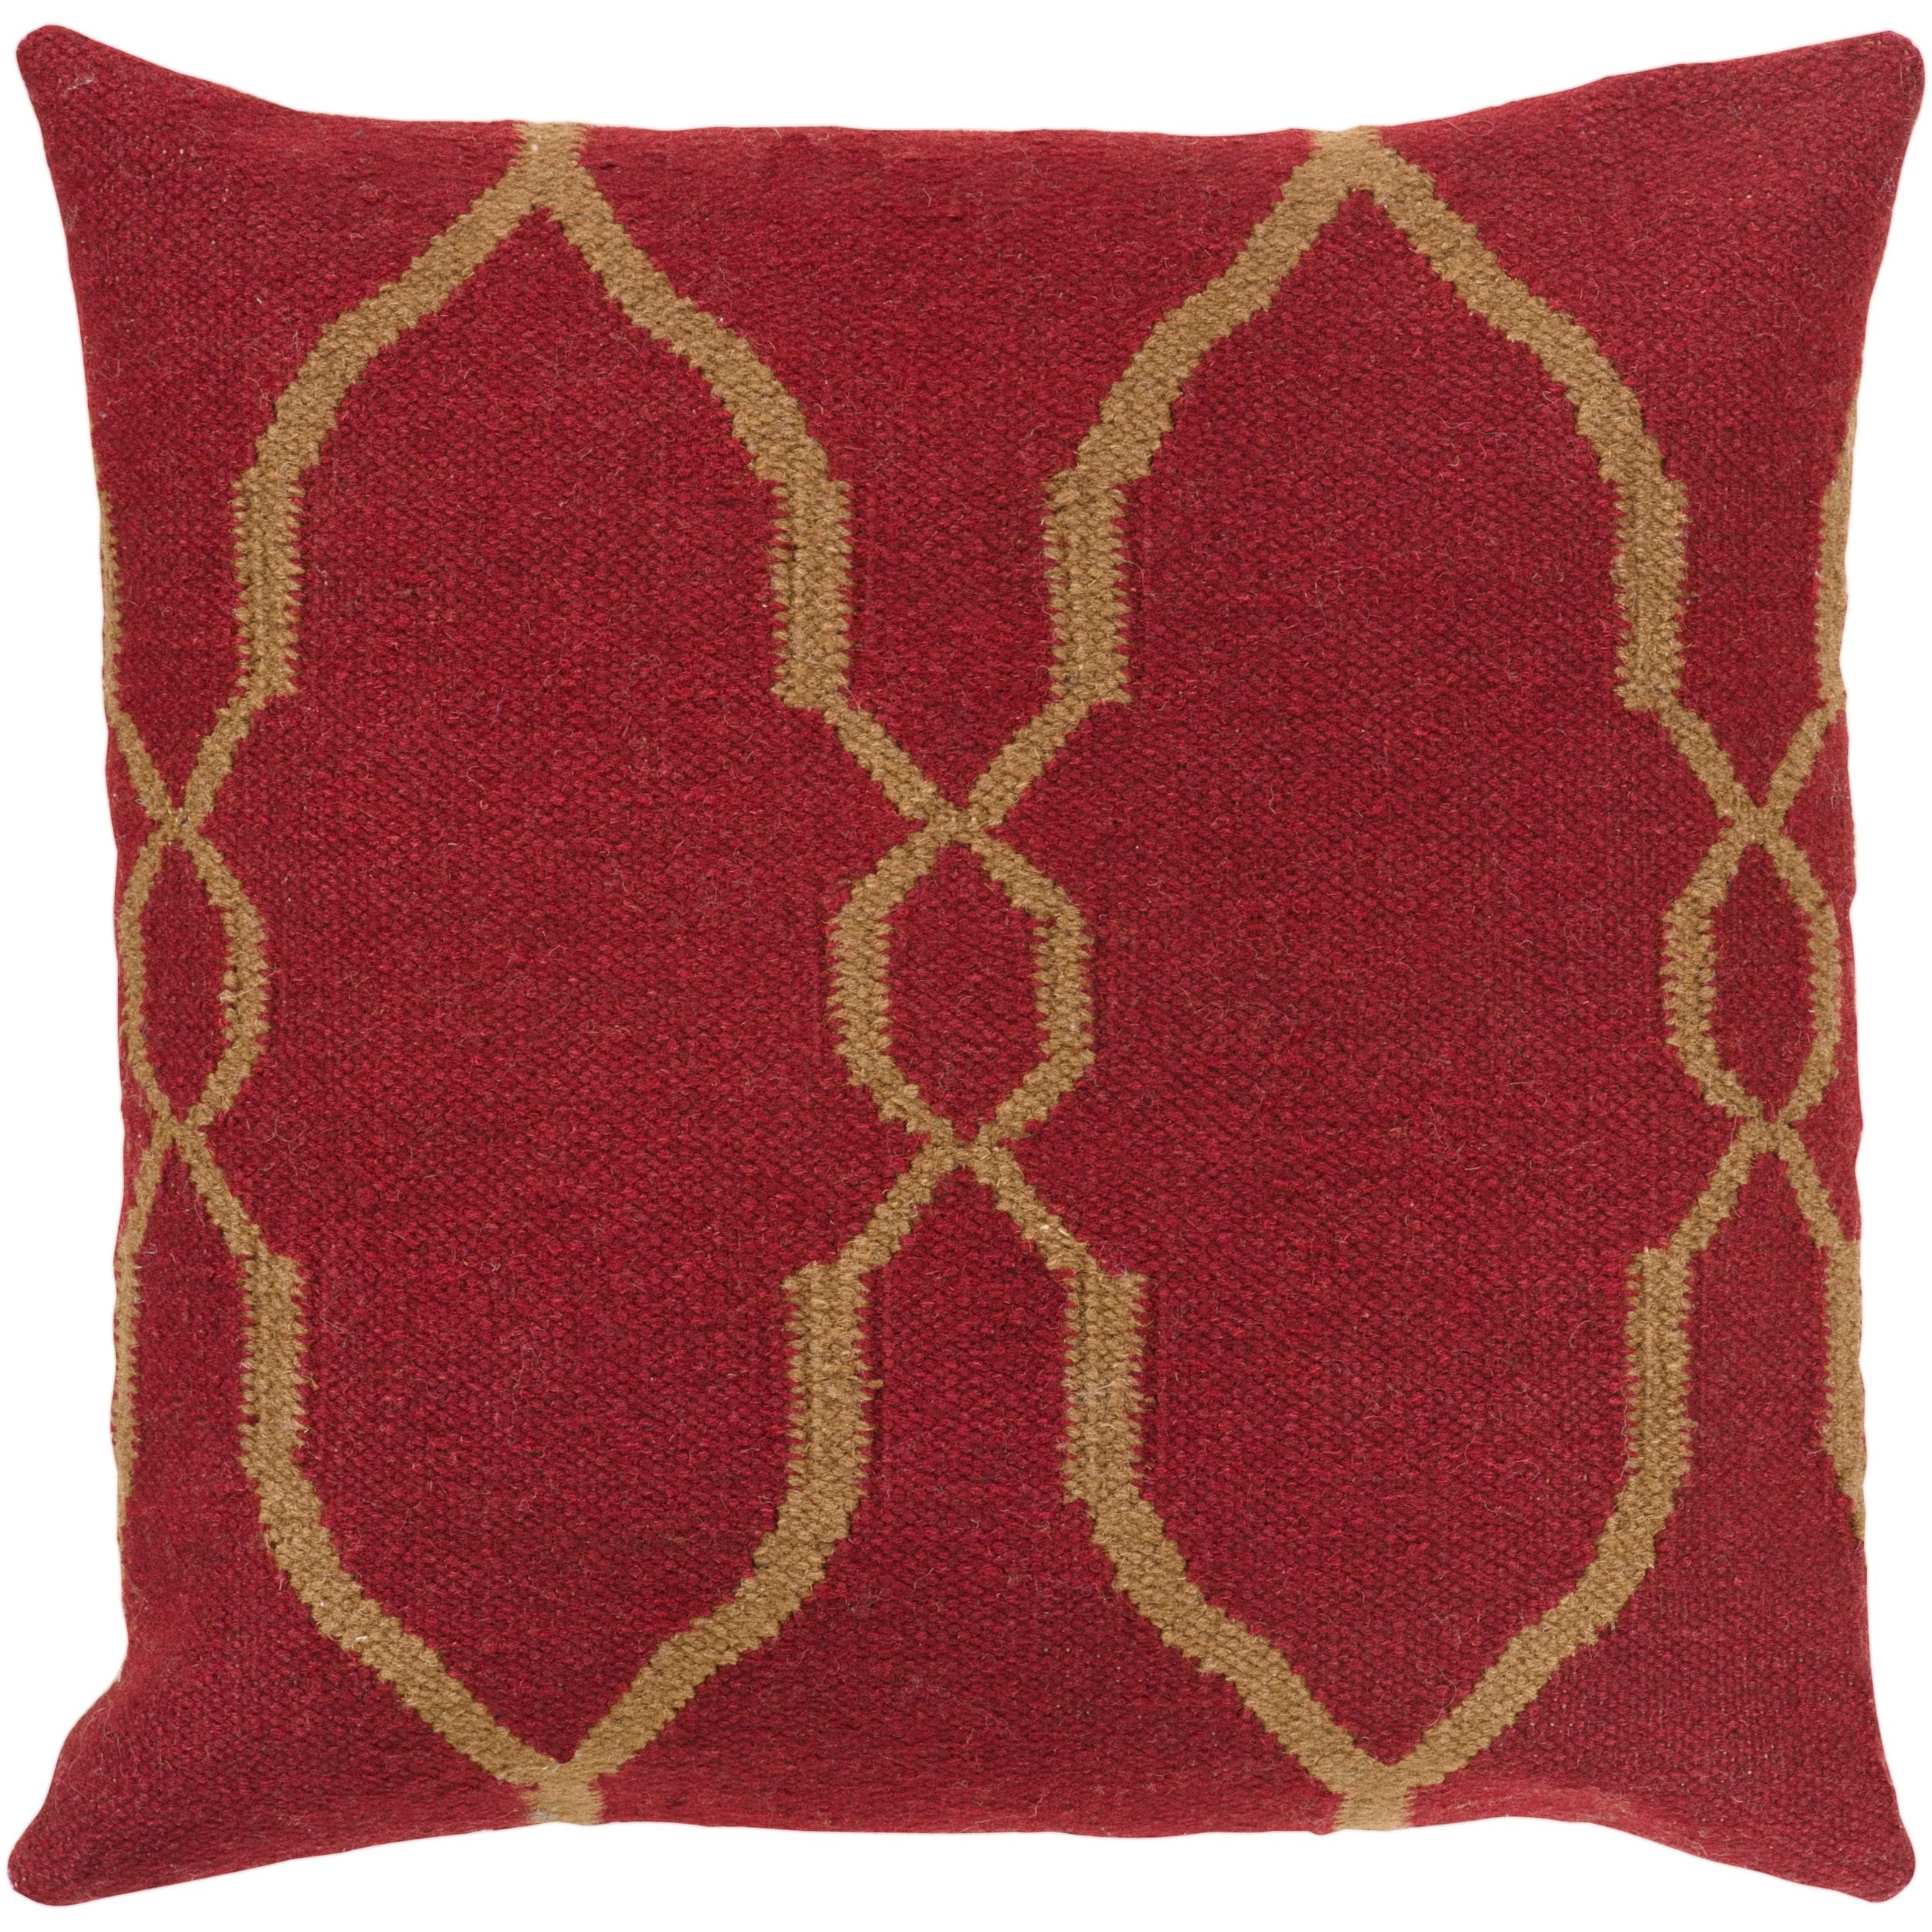 Decorative Faz 18-inch Decorative Pillow